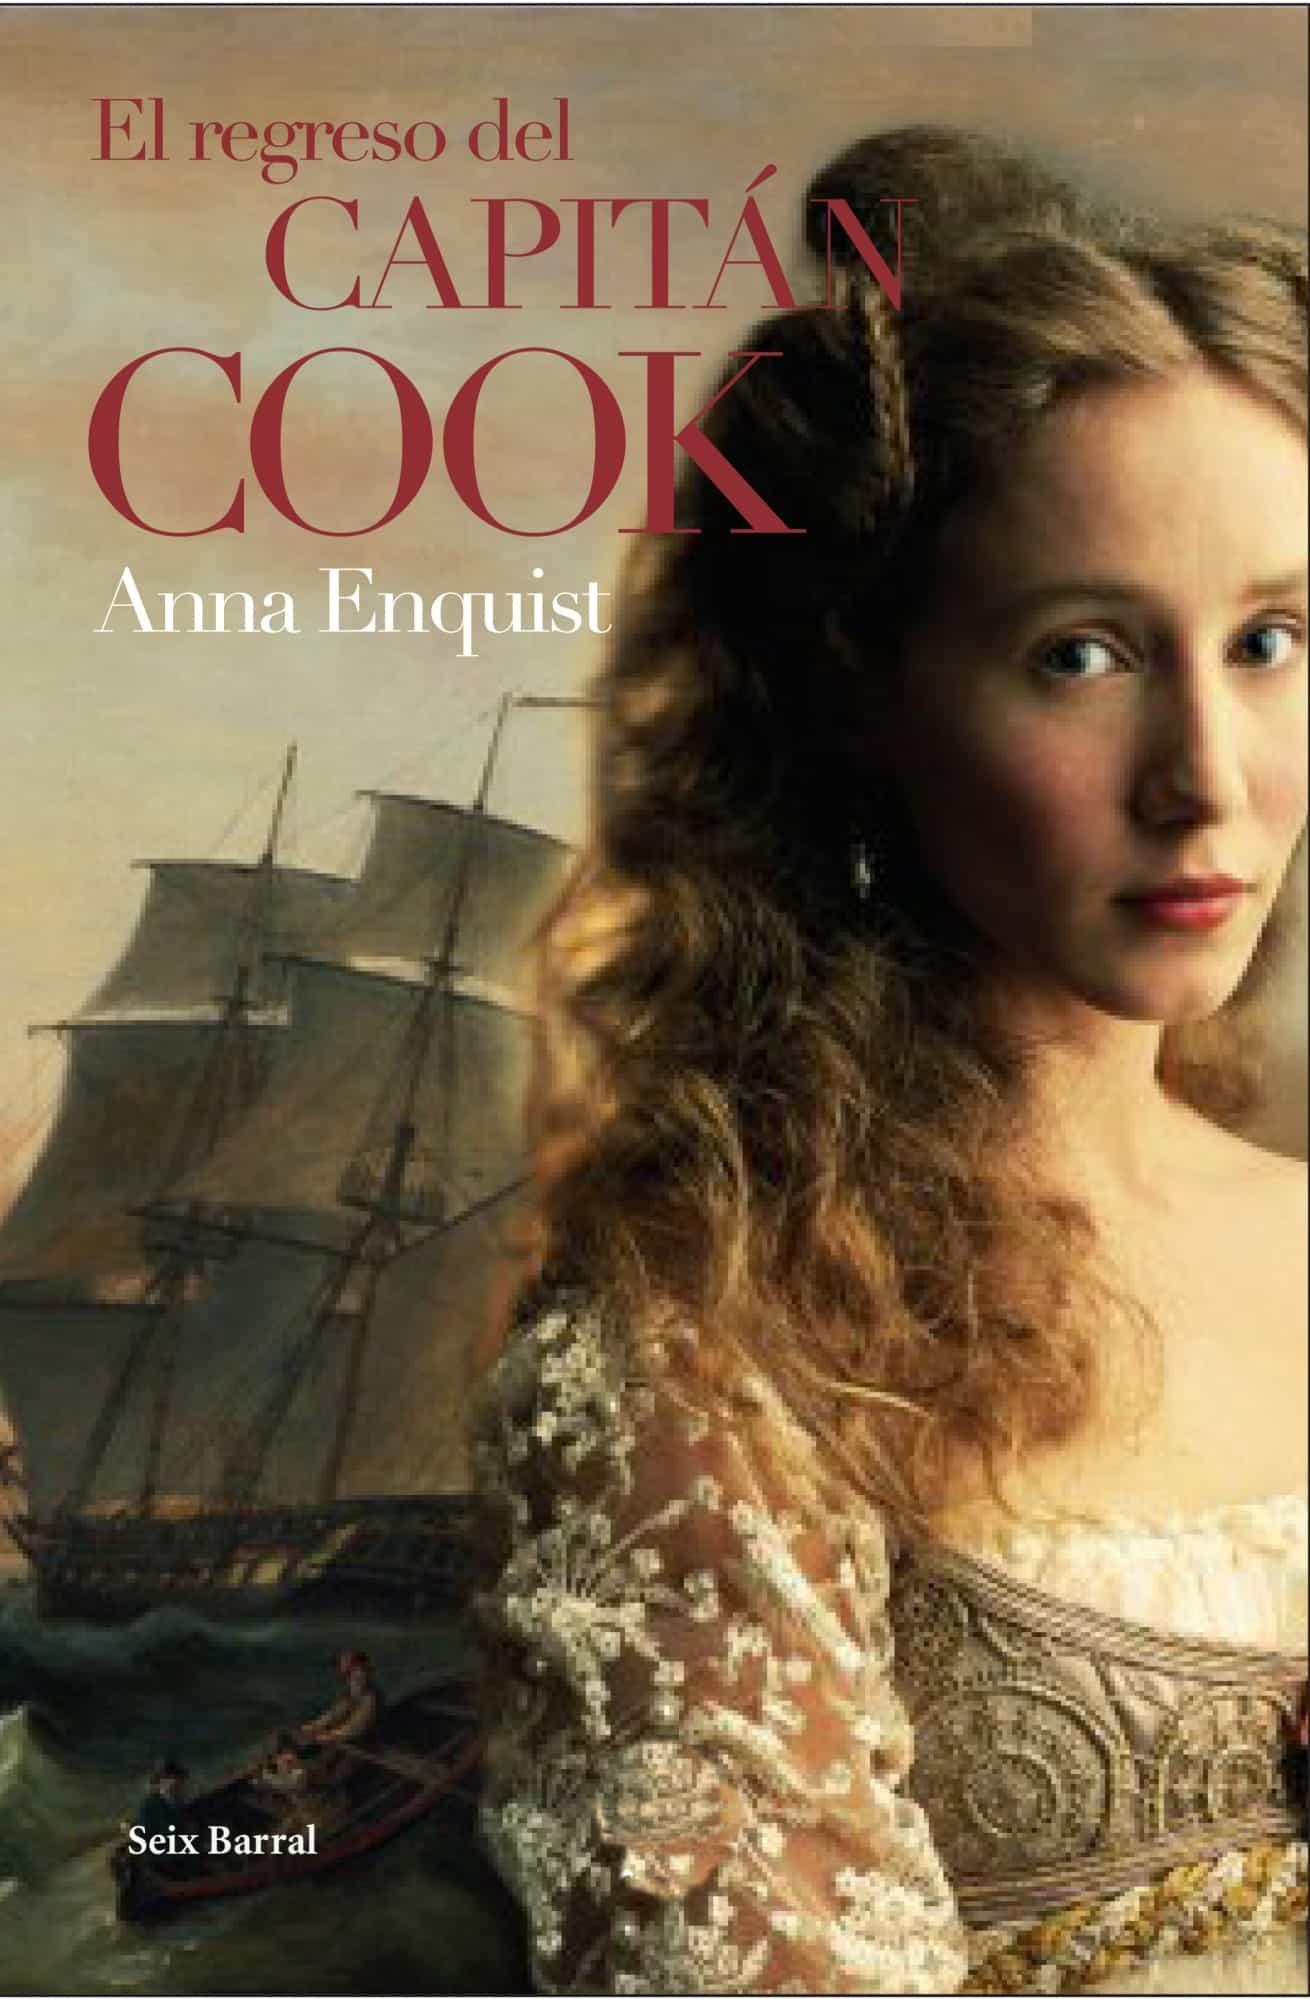 El Regreso Del Capitan Cook por Anna Enquist epub